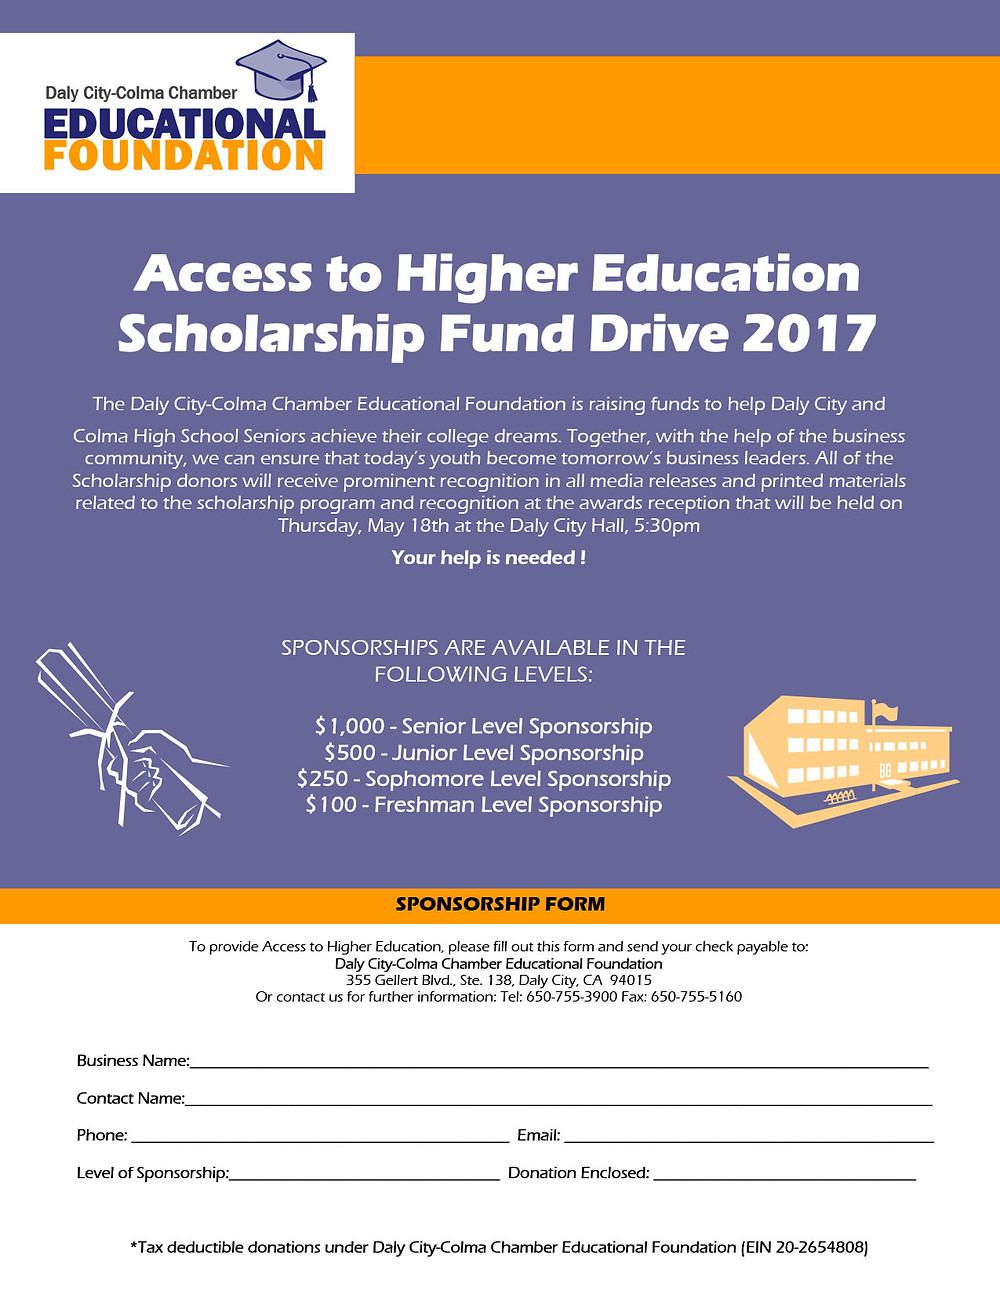 Daly City-Colma Chamber Educational Foundation 2017 Scholarship Application